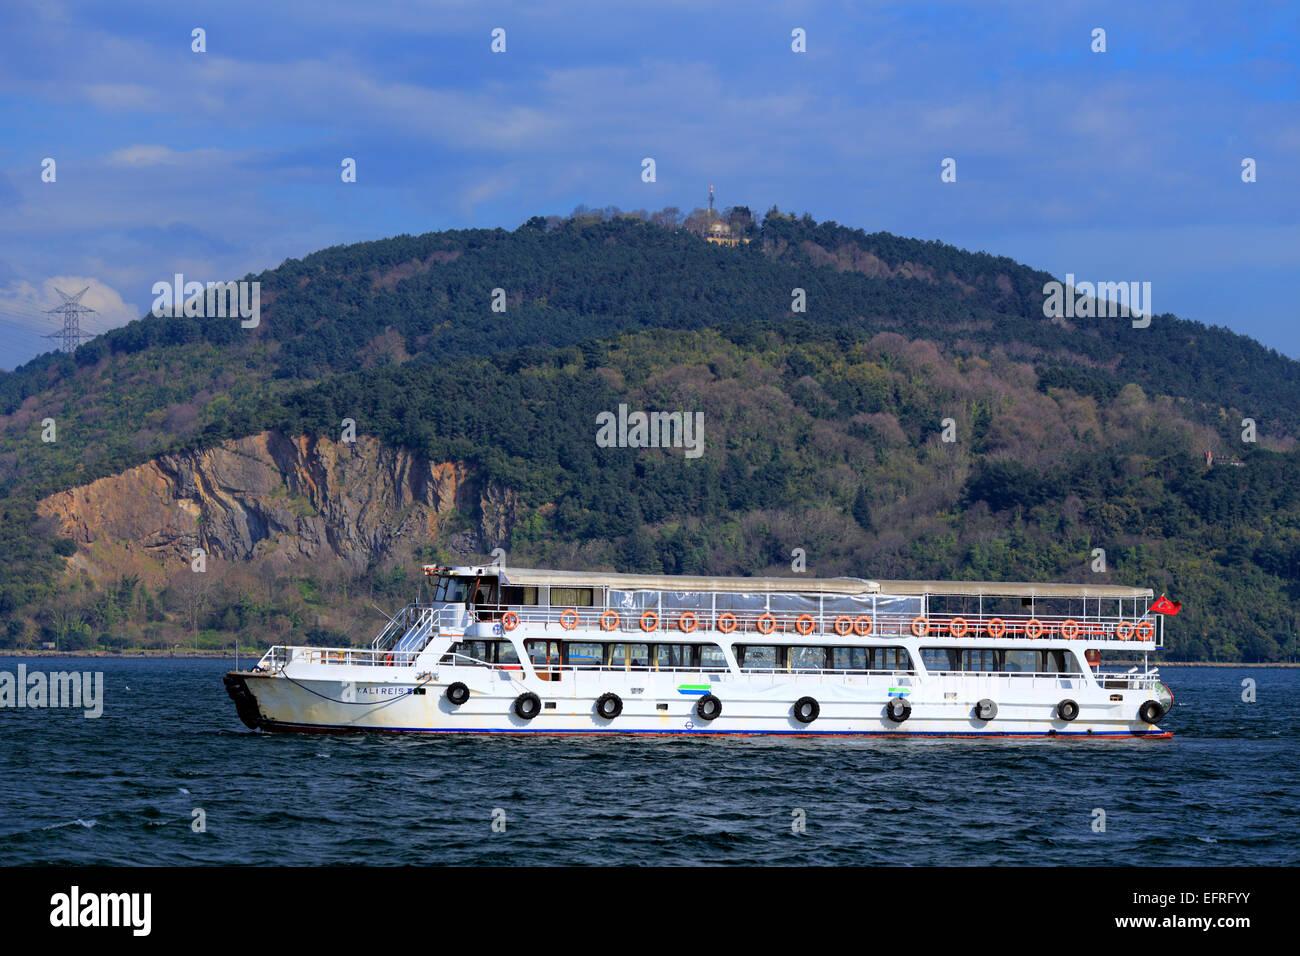 Tourist ship at Bosphorus, Istanbul, Turkey - Stock Image